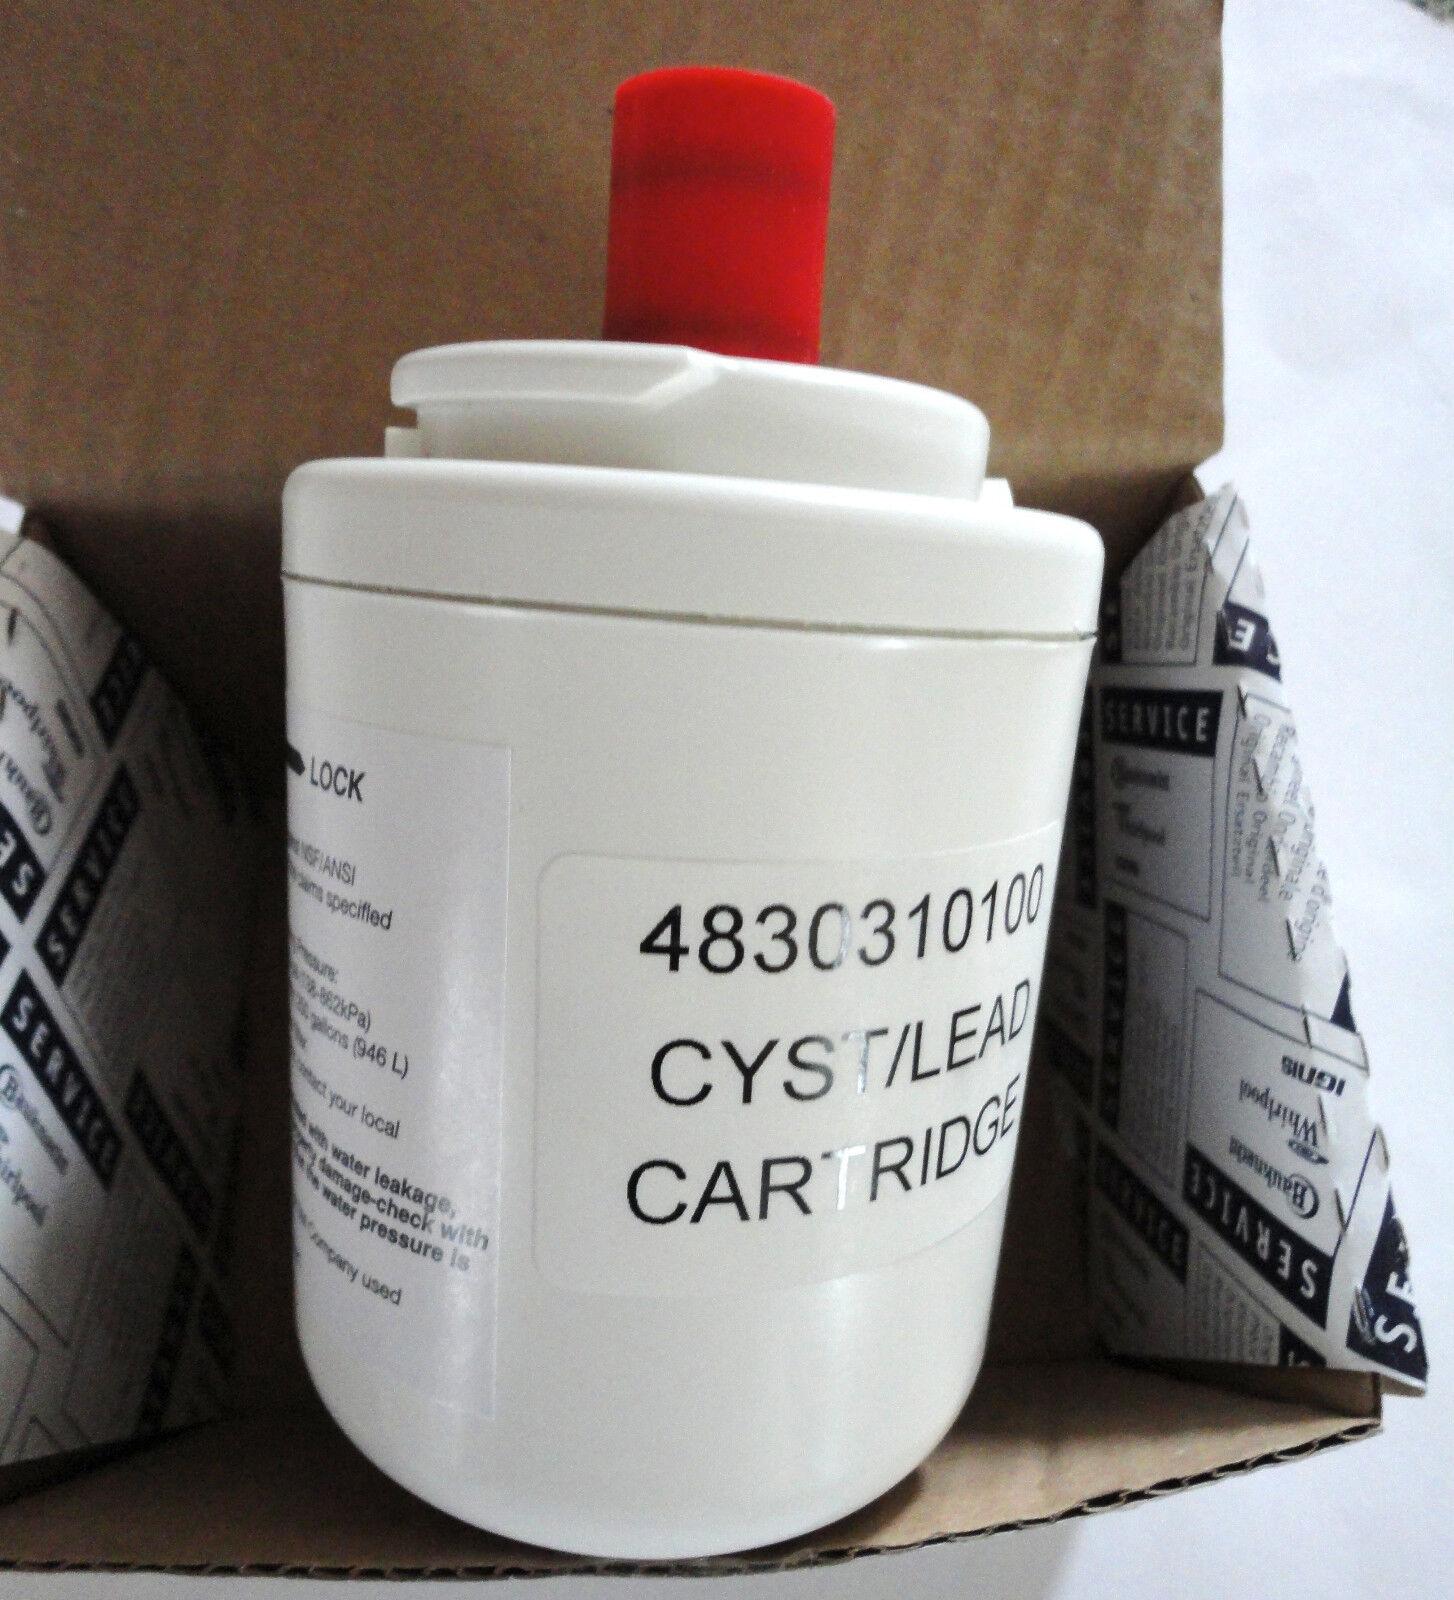 Replacement refrigerator fridge water filter - Leisure 4830310100 4346610101